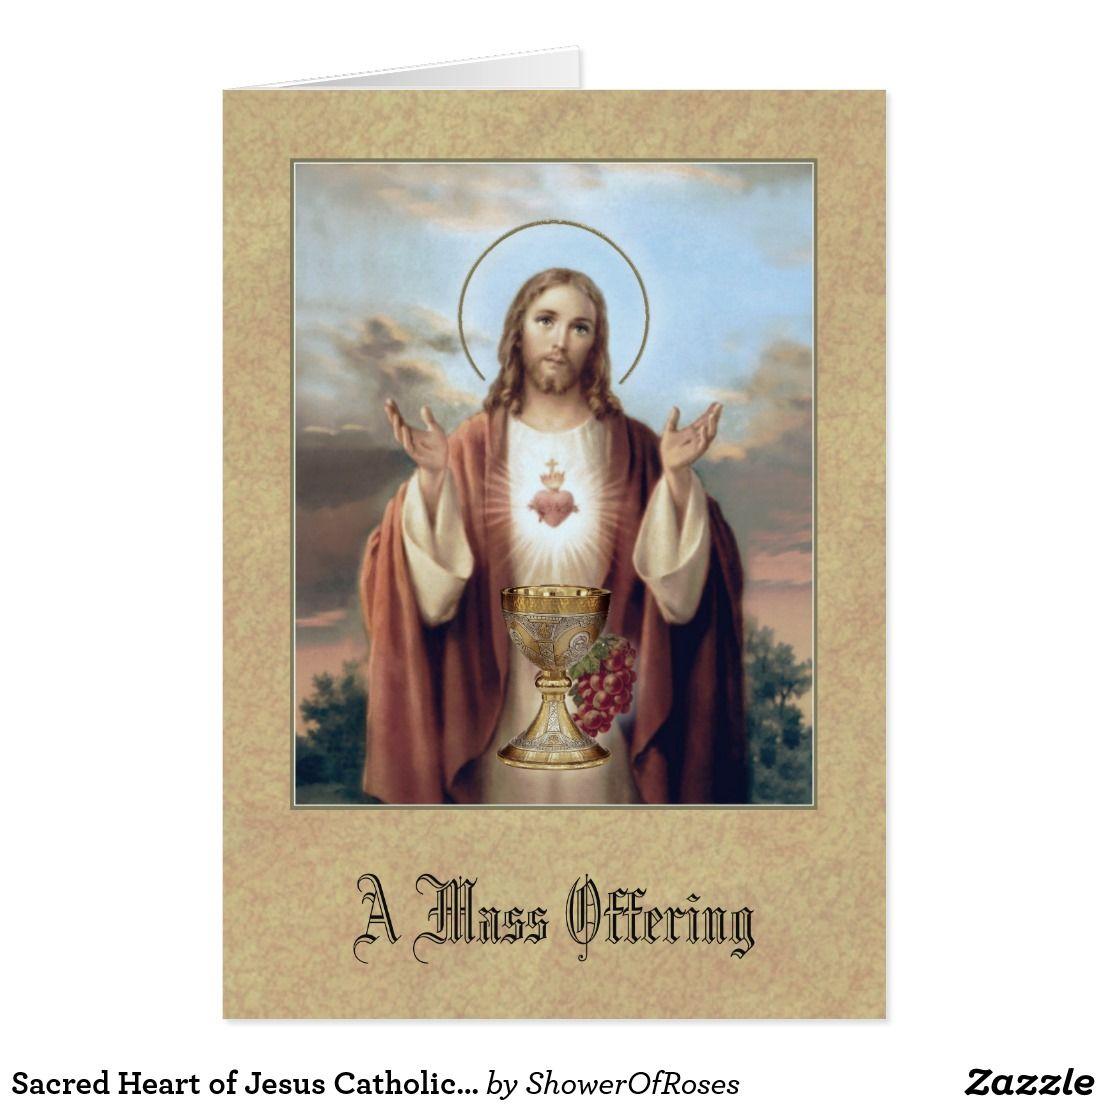 Sacred Heart Of Jesus Catholic Mass Offering Card